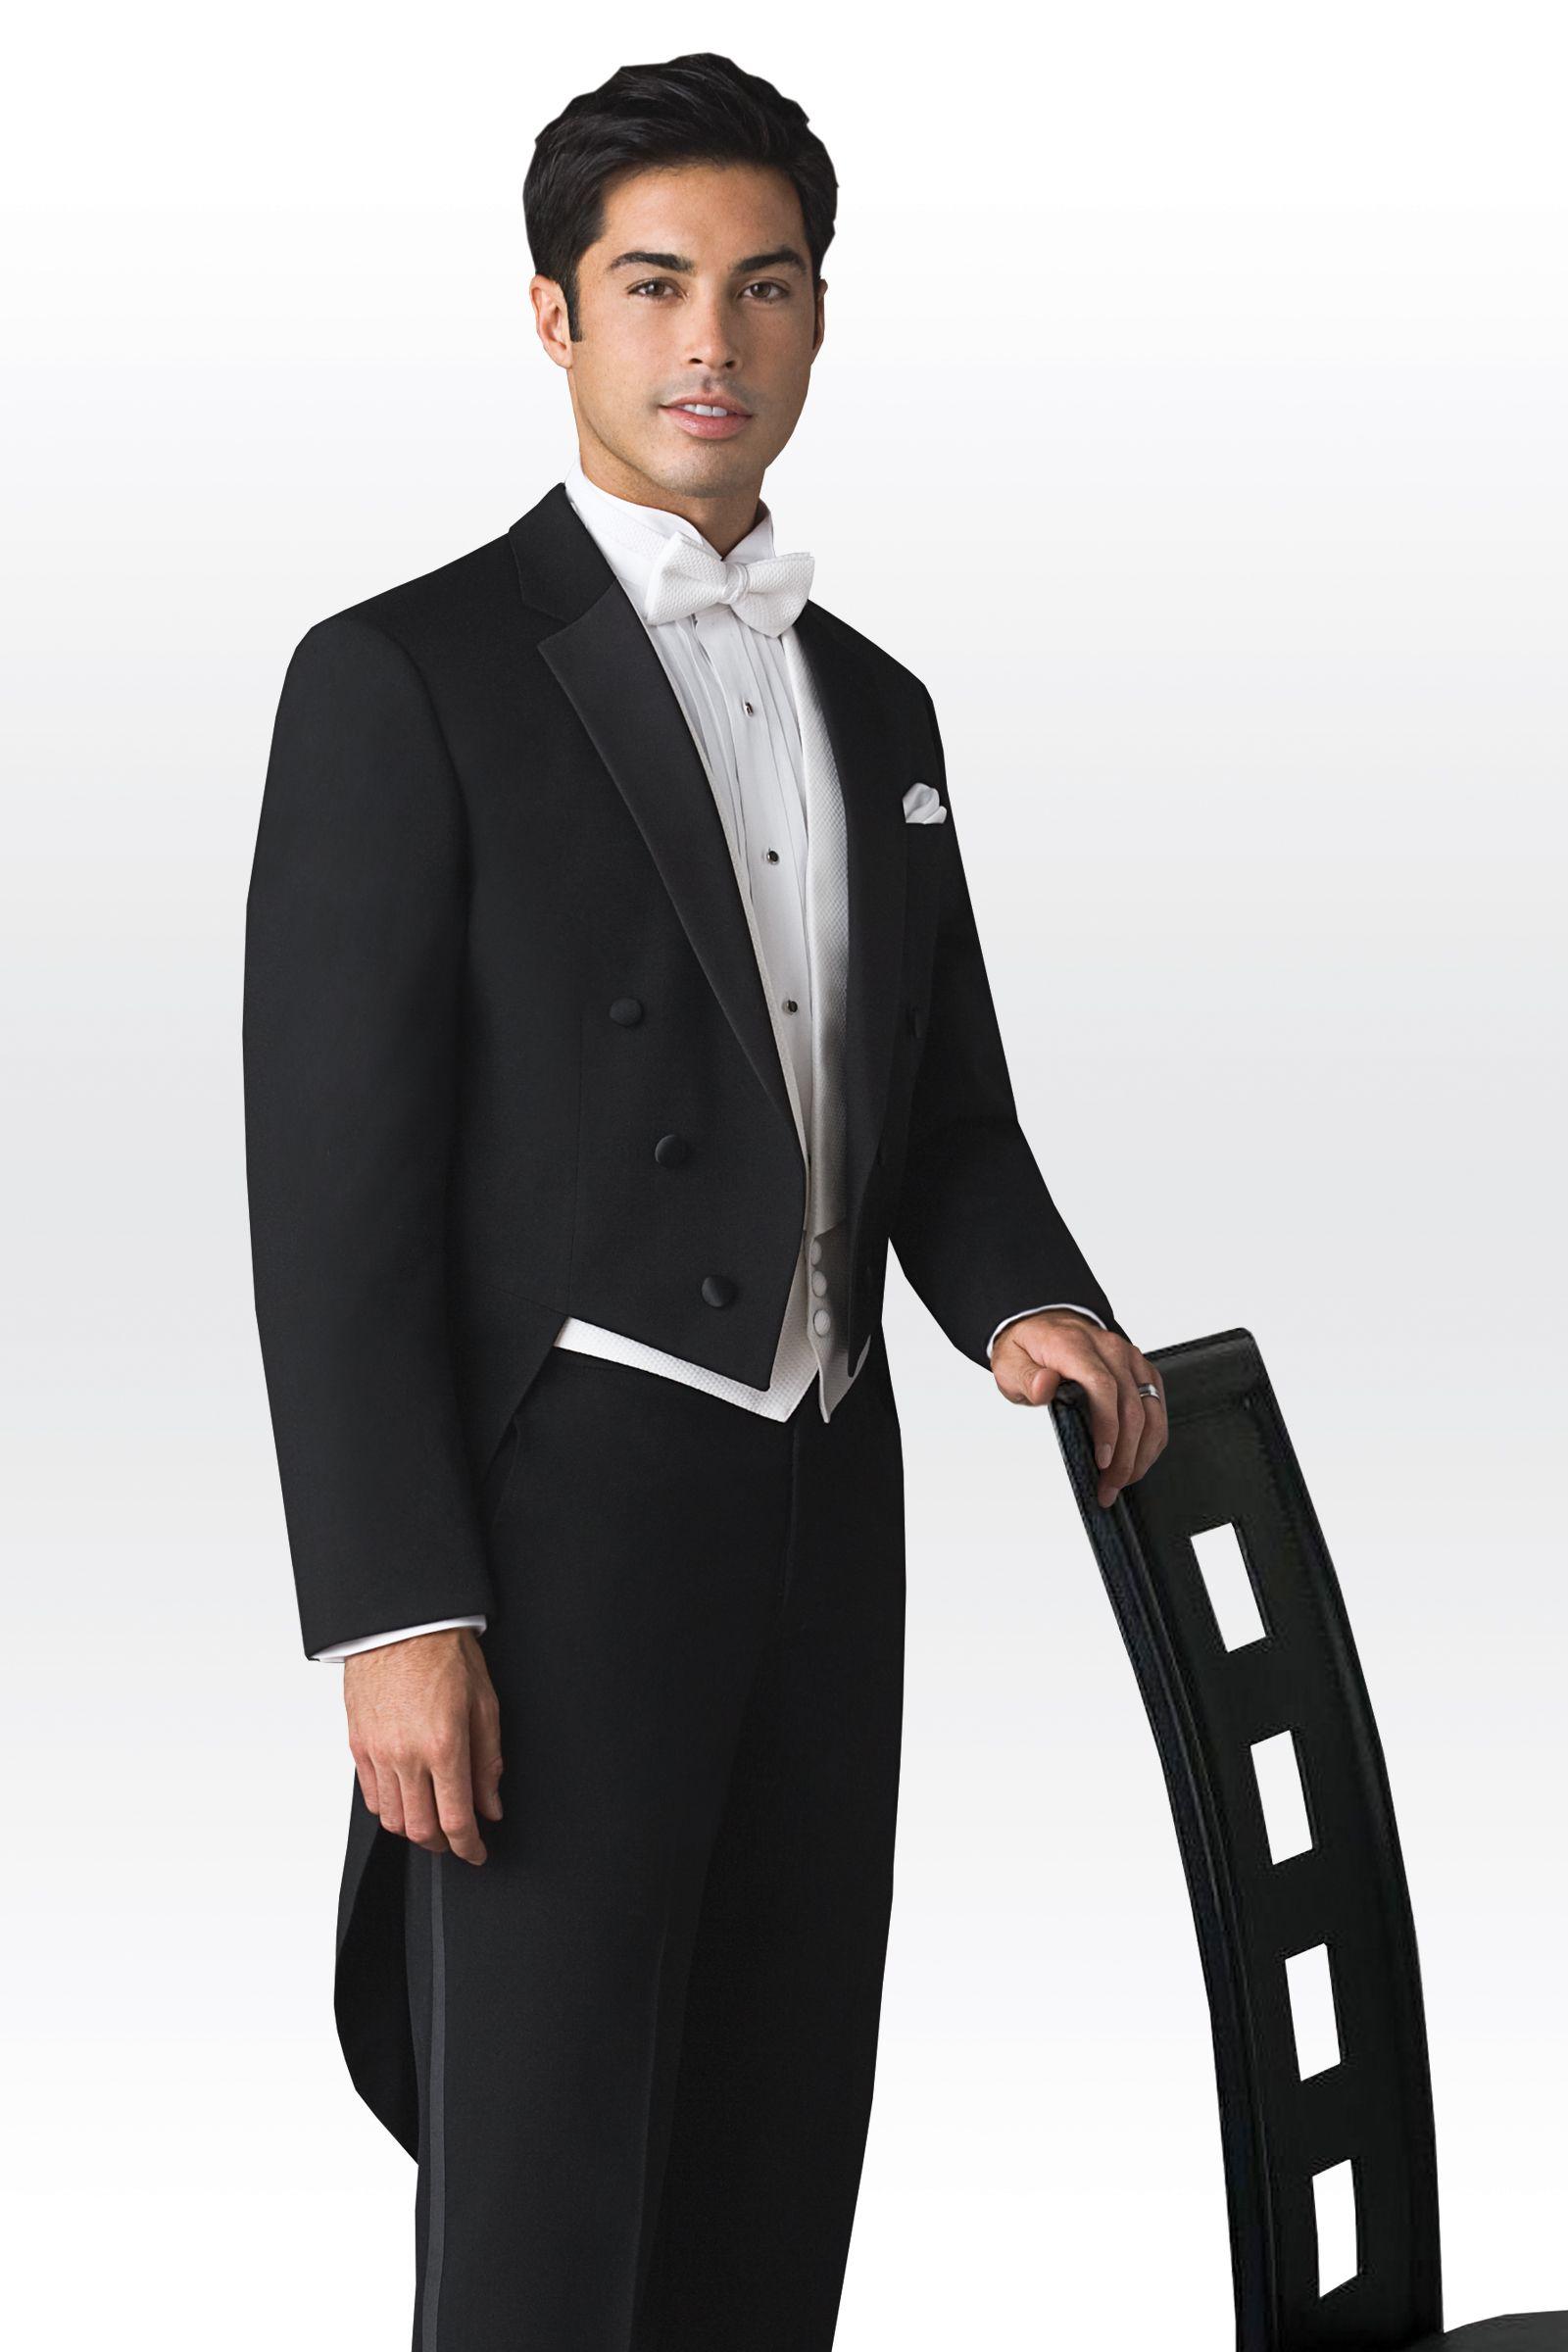 Imagini Pentru Matching Prom Dresses And Suits